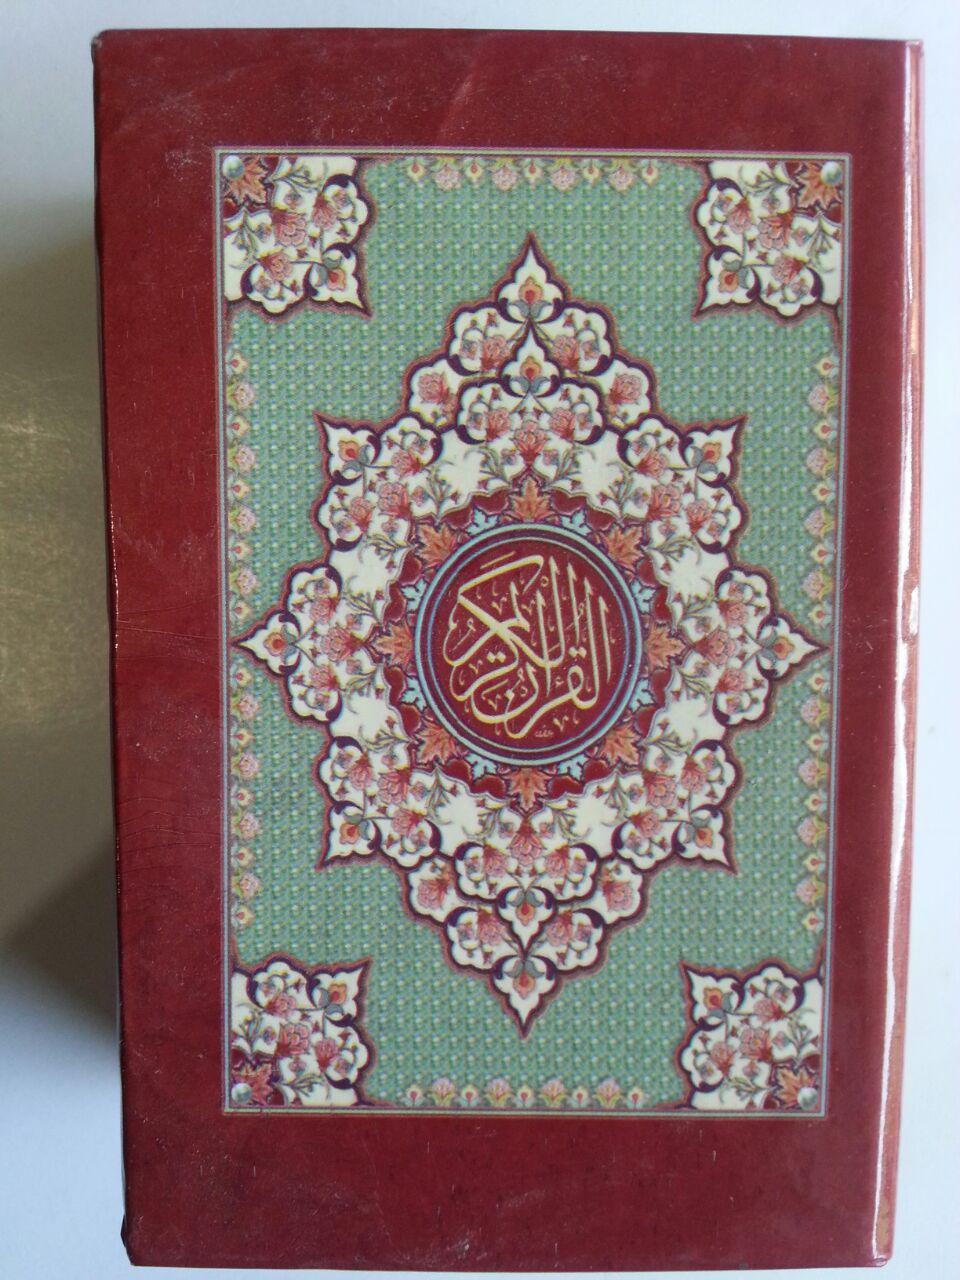 Al-Qur'an Impor Per Juz Tanpa Terjemah Ukuran 8x12 cover 2